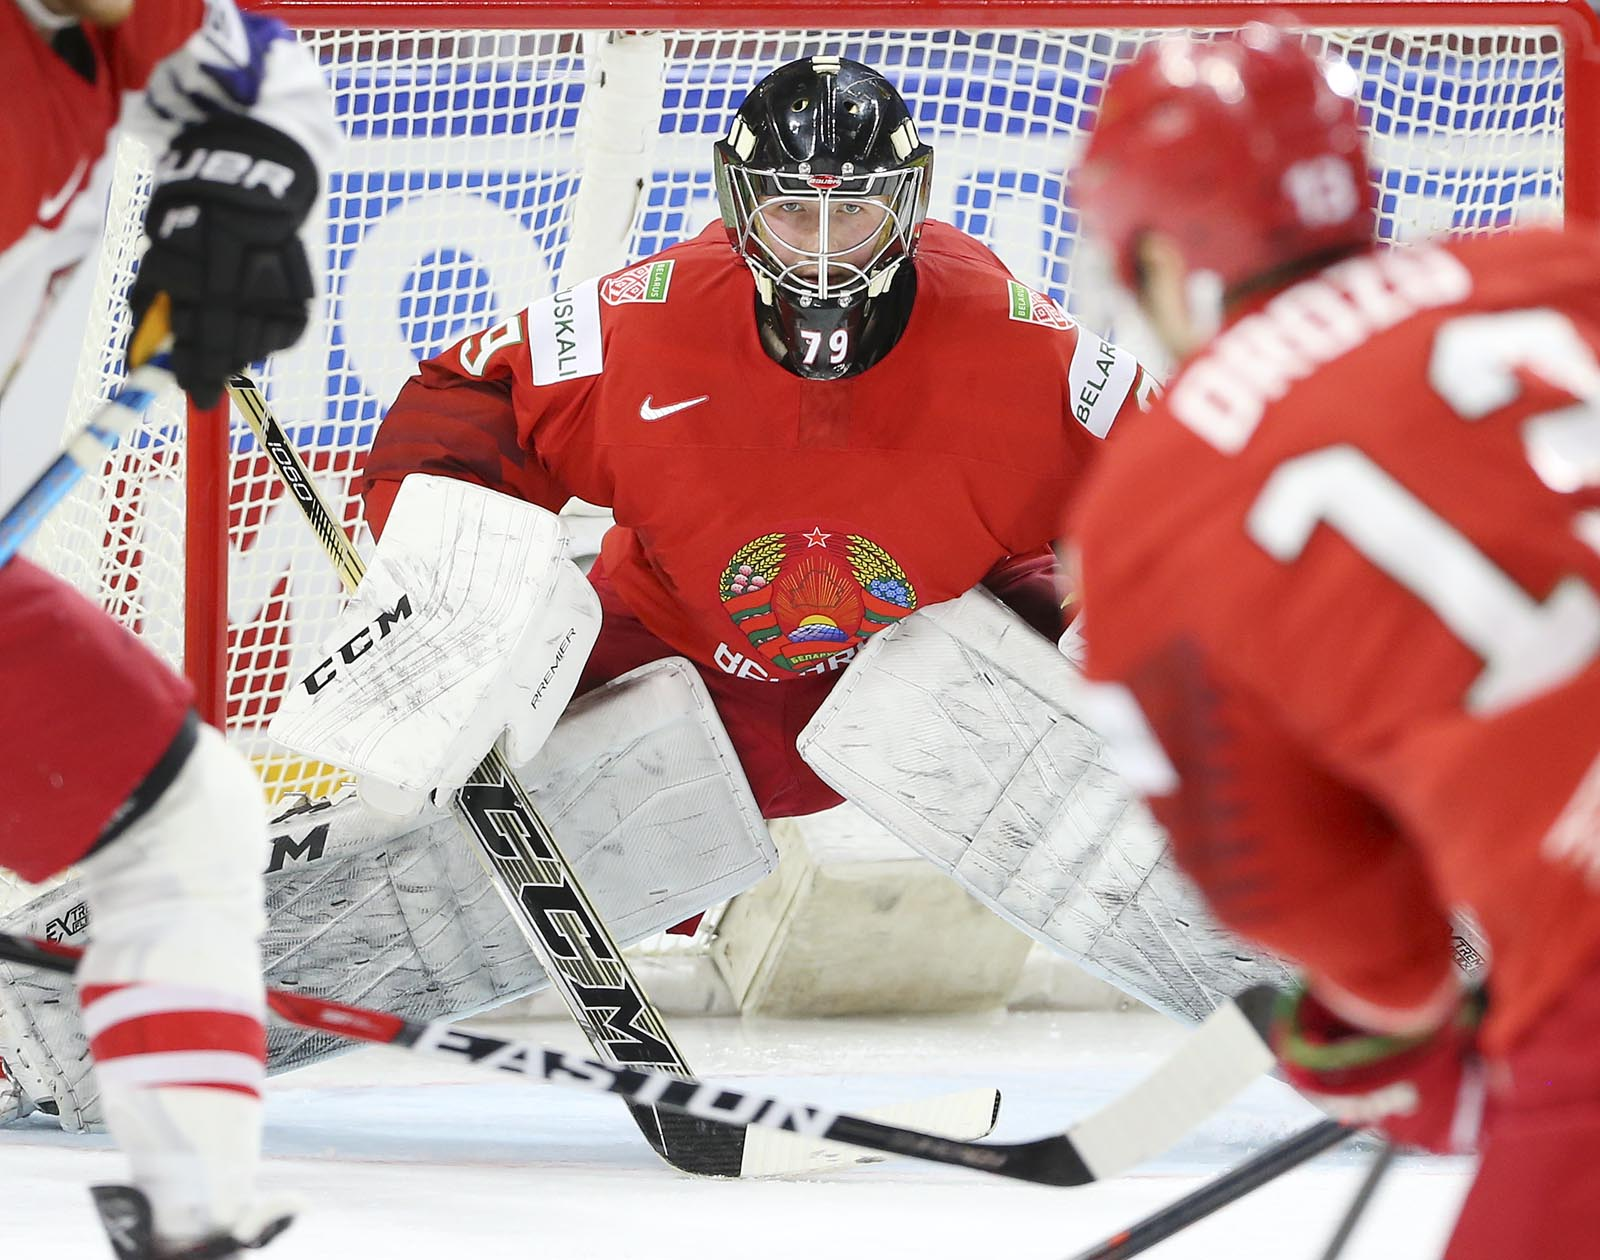 Матч Беларусь - Чехия